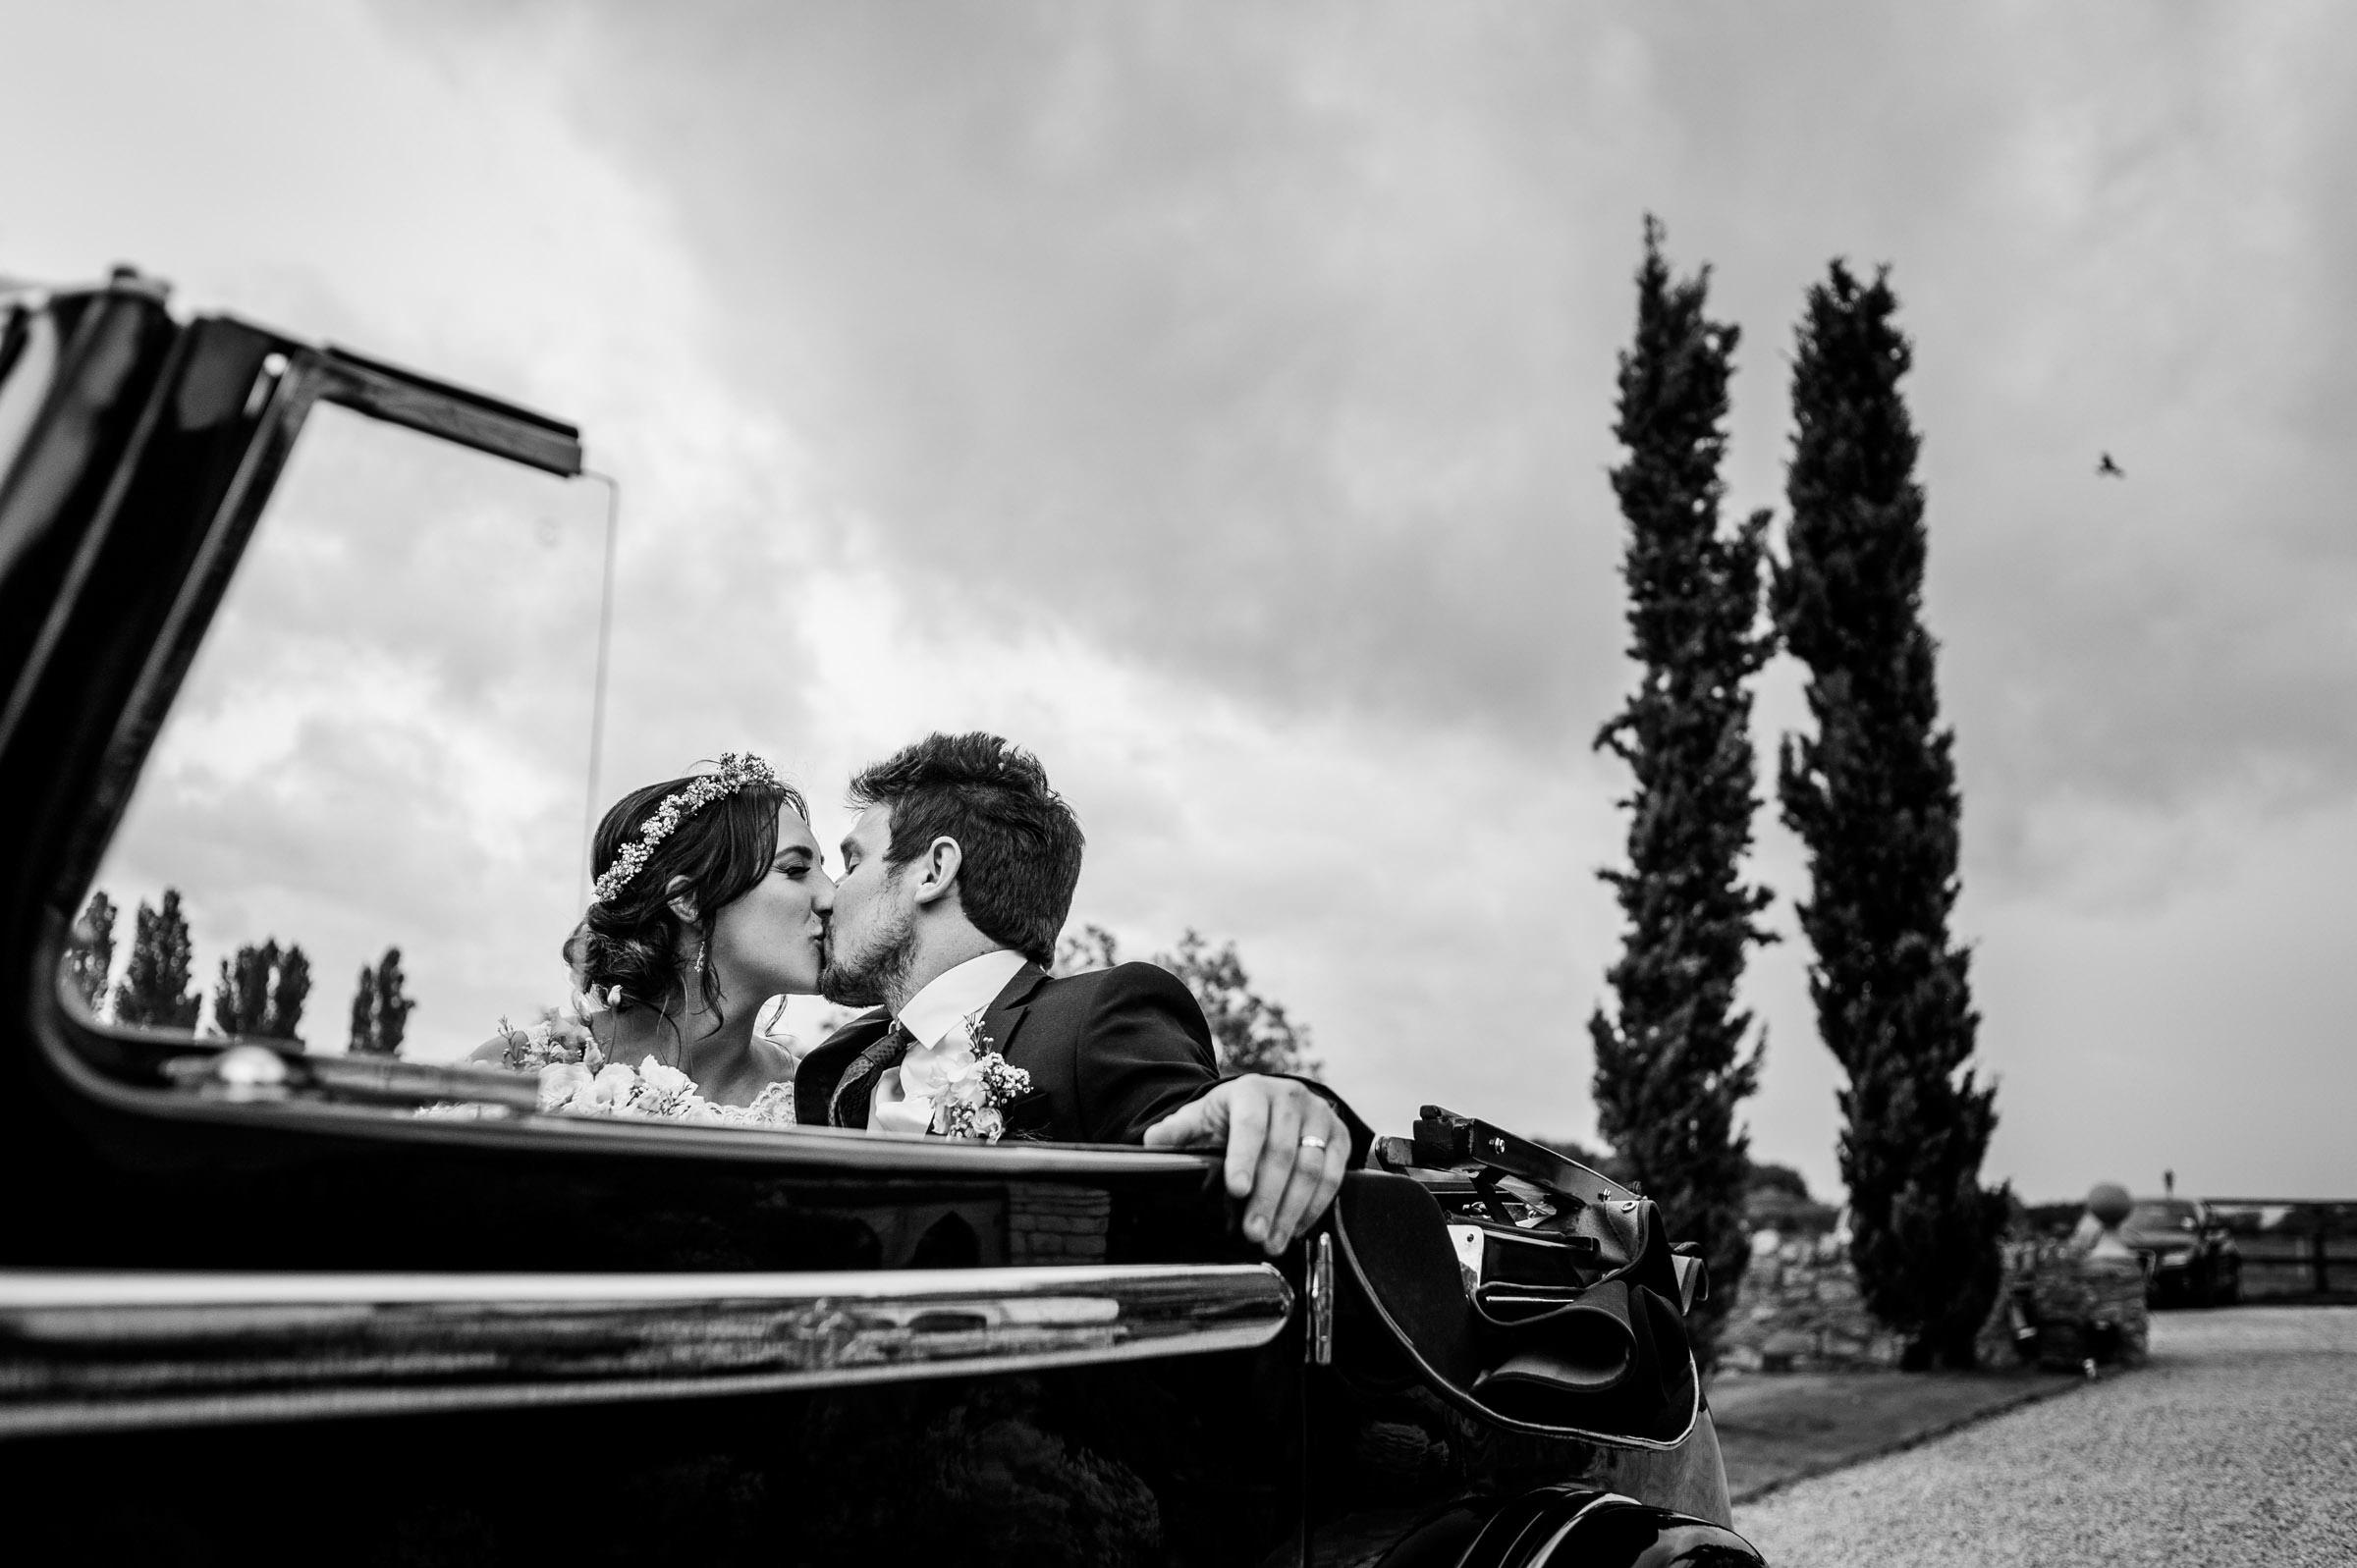 Notley Tythe Barn Reportage Wedding Photos 018.jpg